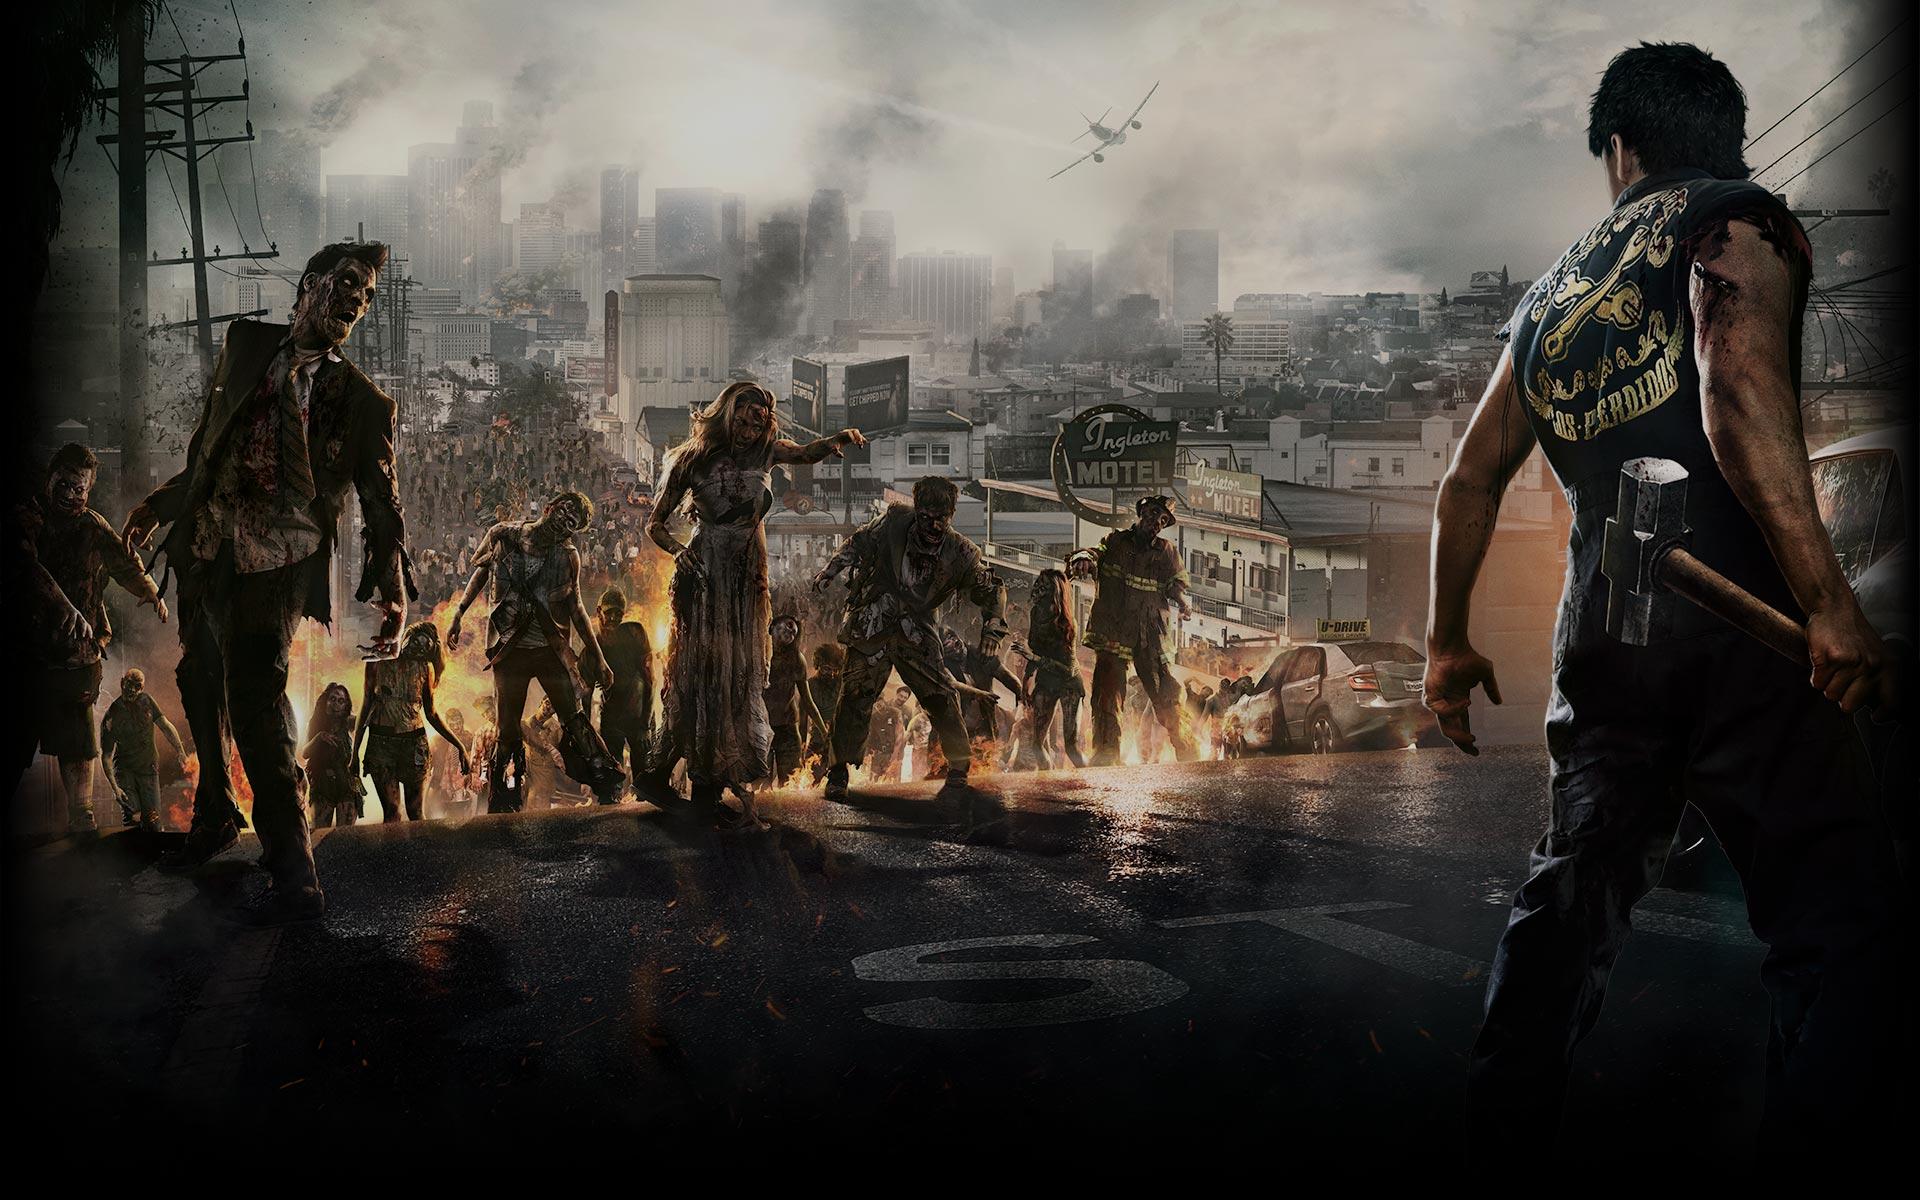 zombie horde wallpaper hd - photo #3